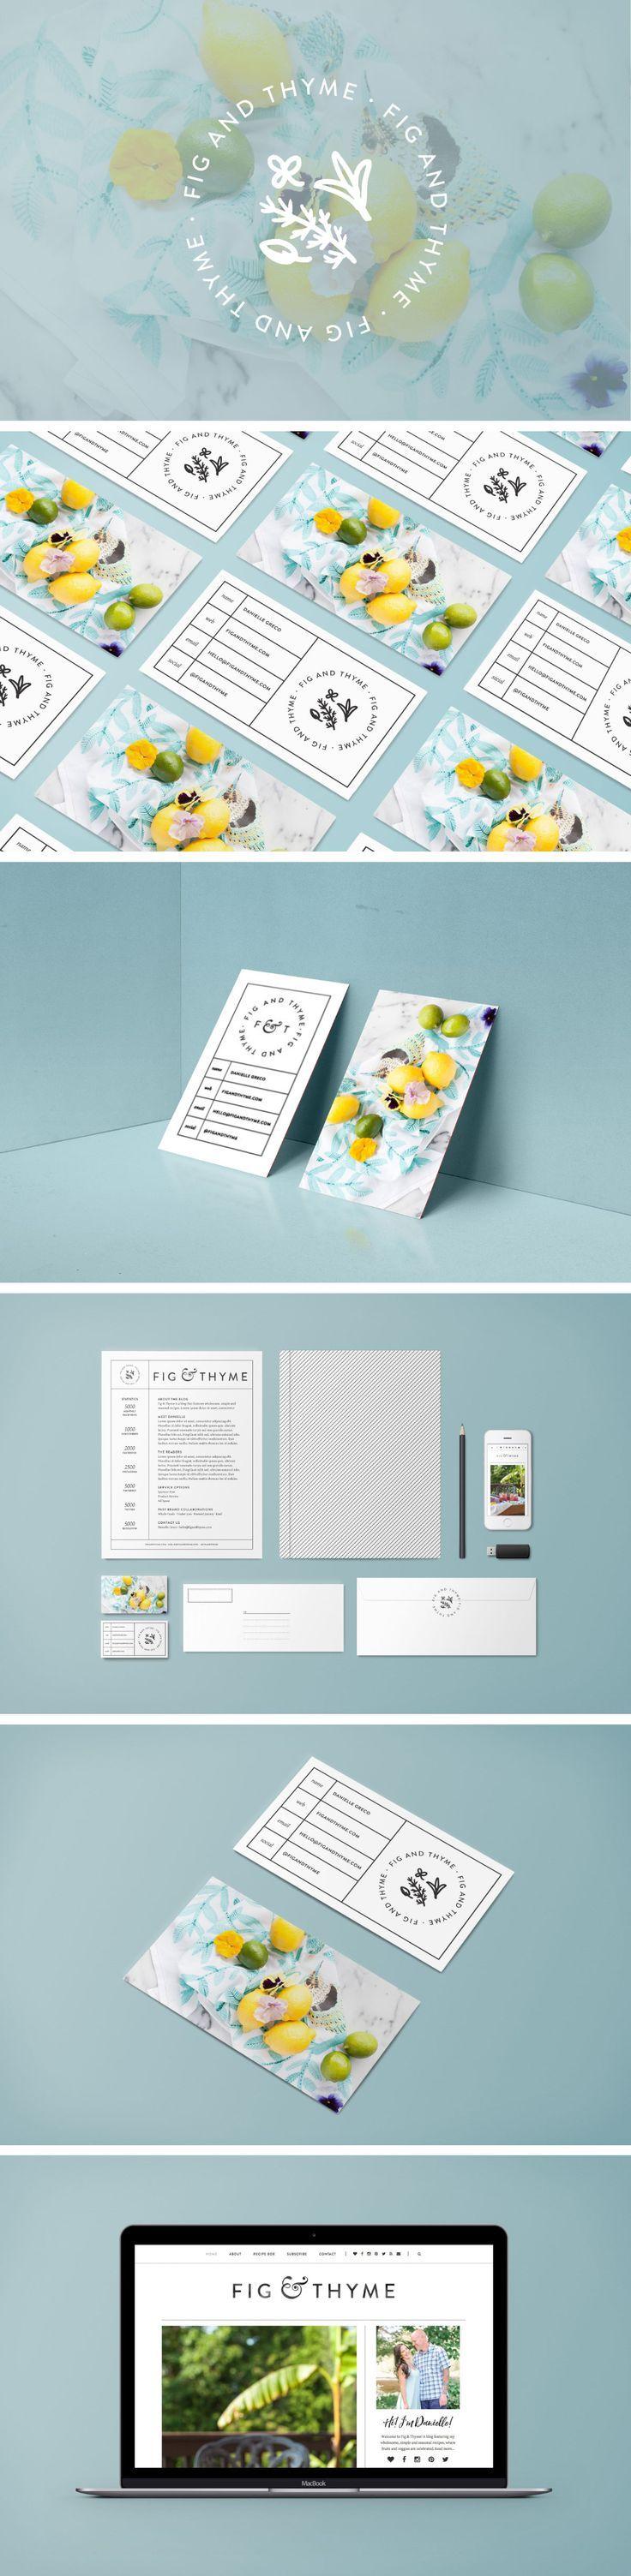 859 best business card designs images on pinterest